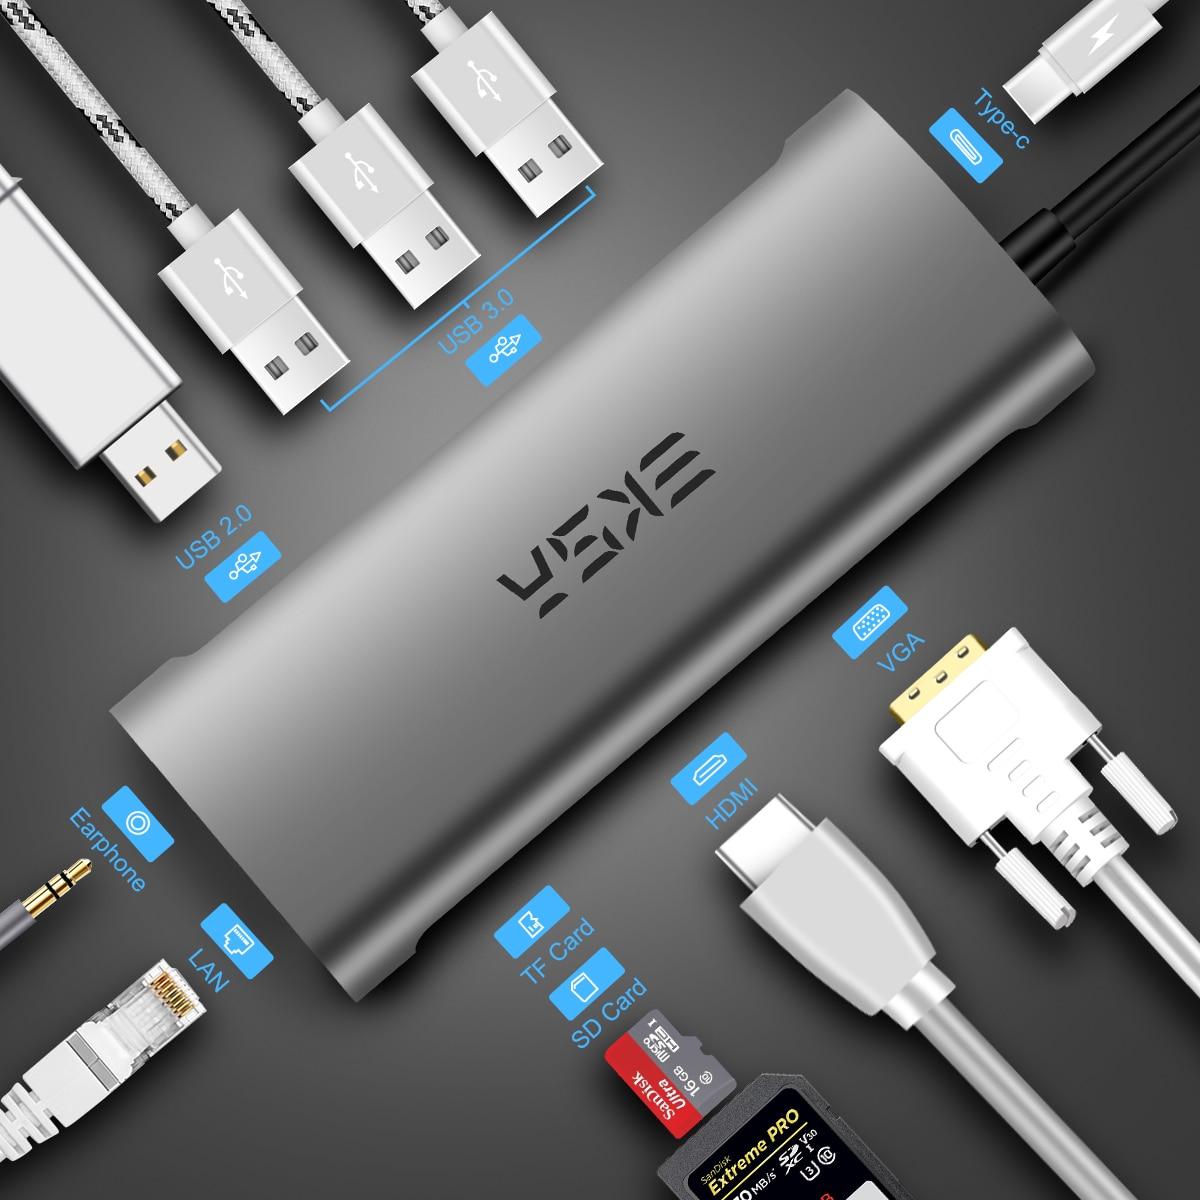 EKSA USB type C Hub vers HDMI/RJ45 Gigabit Ethernet/VGA/lecteur de carte/Thunderbolt 3 adaptateur pour Macbook Huawei P20 Pro USB 3.0 HUB